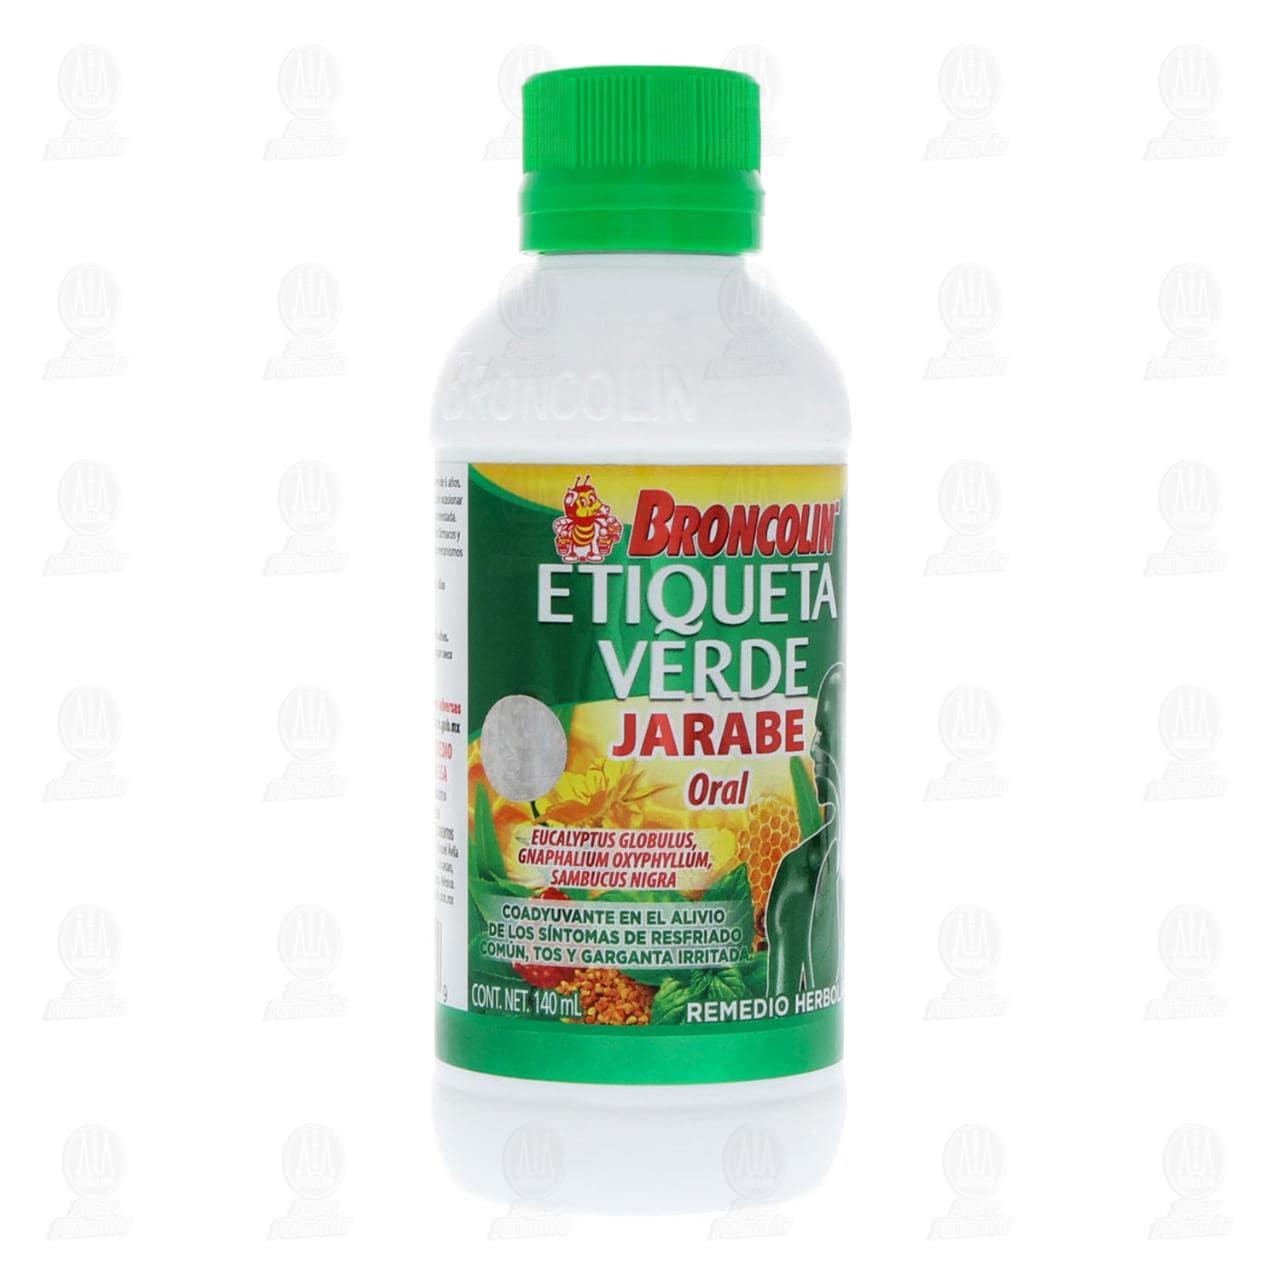 Broncolin Etiqueta Verde Jarabe 140ml